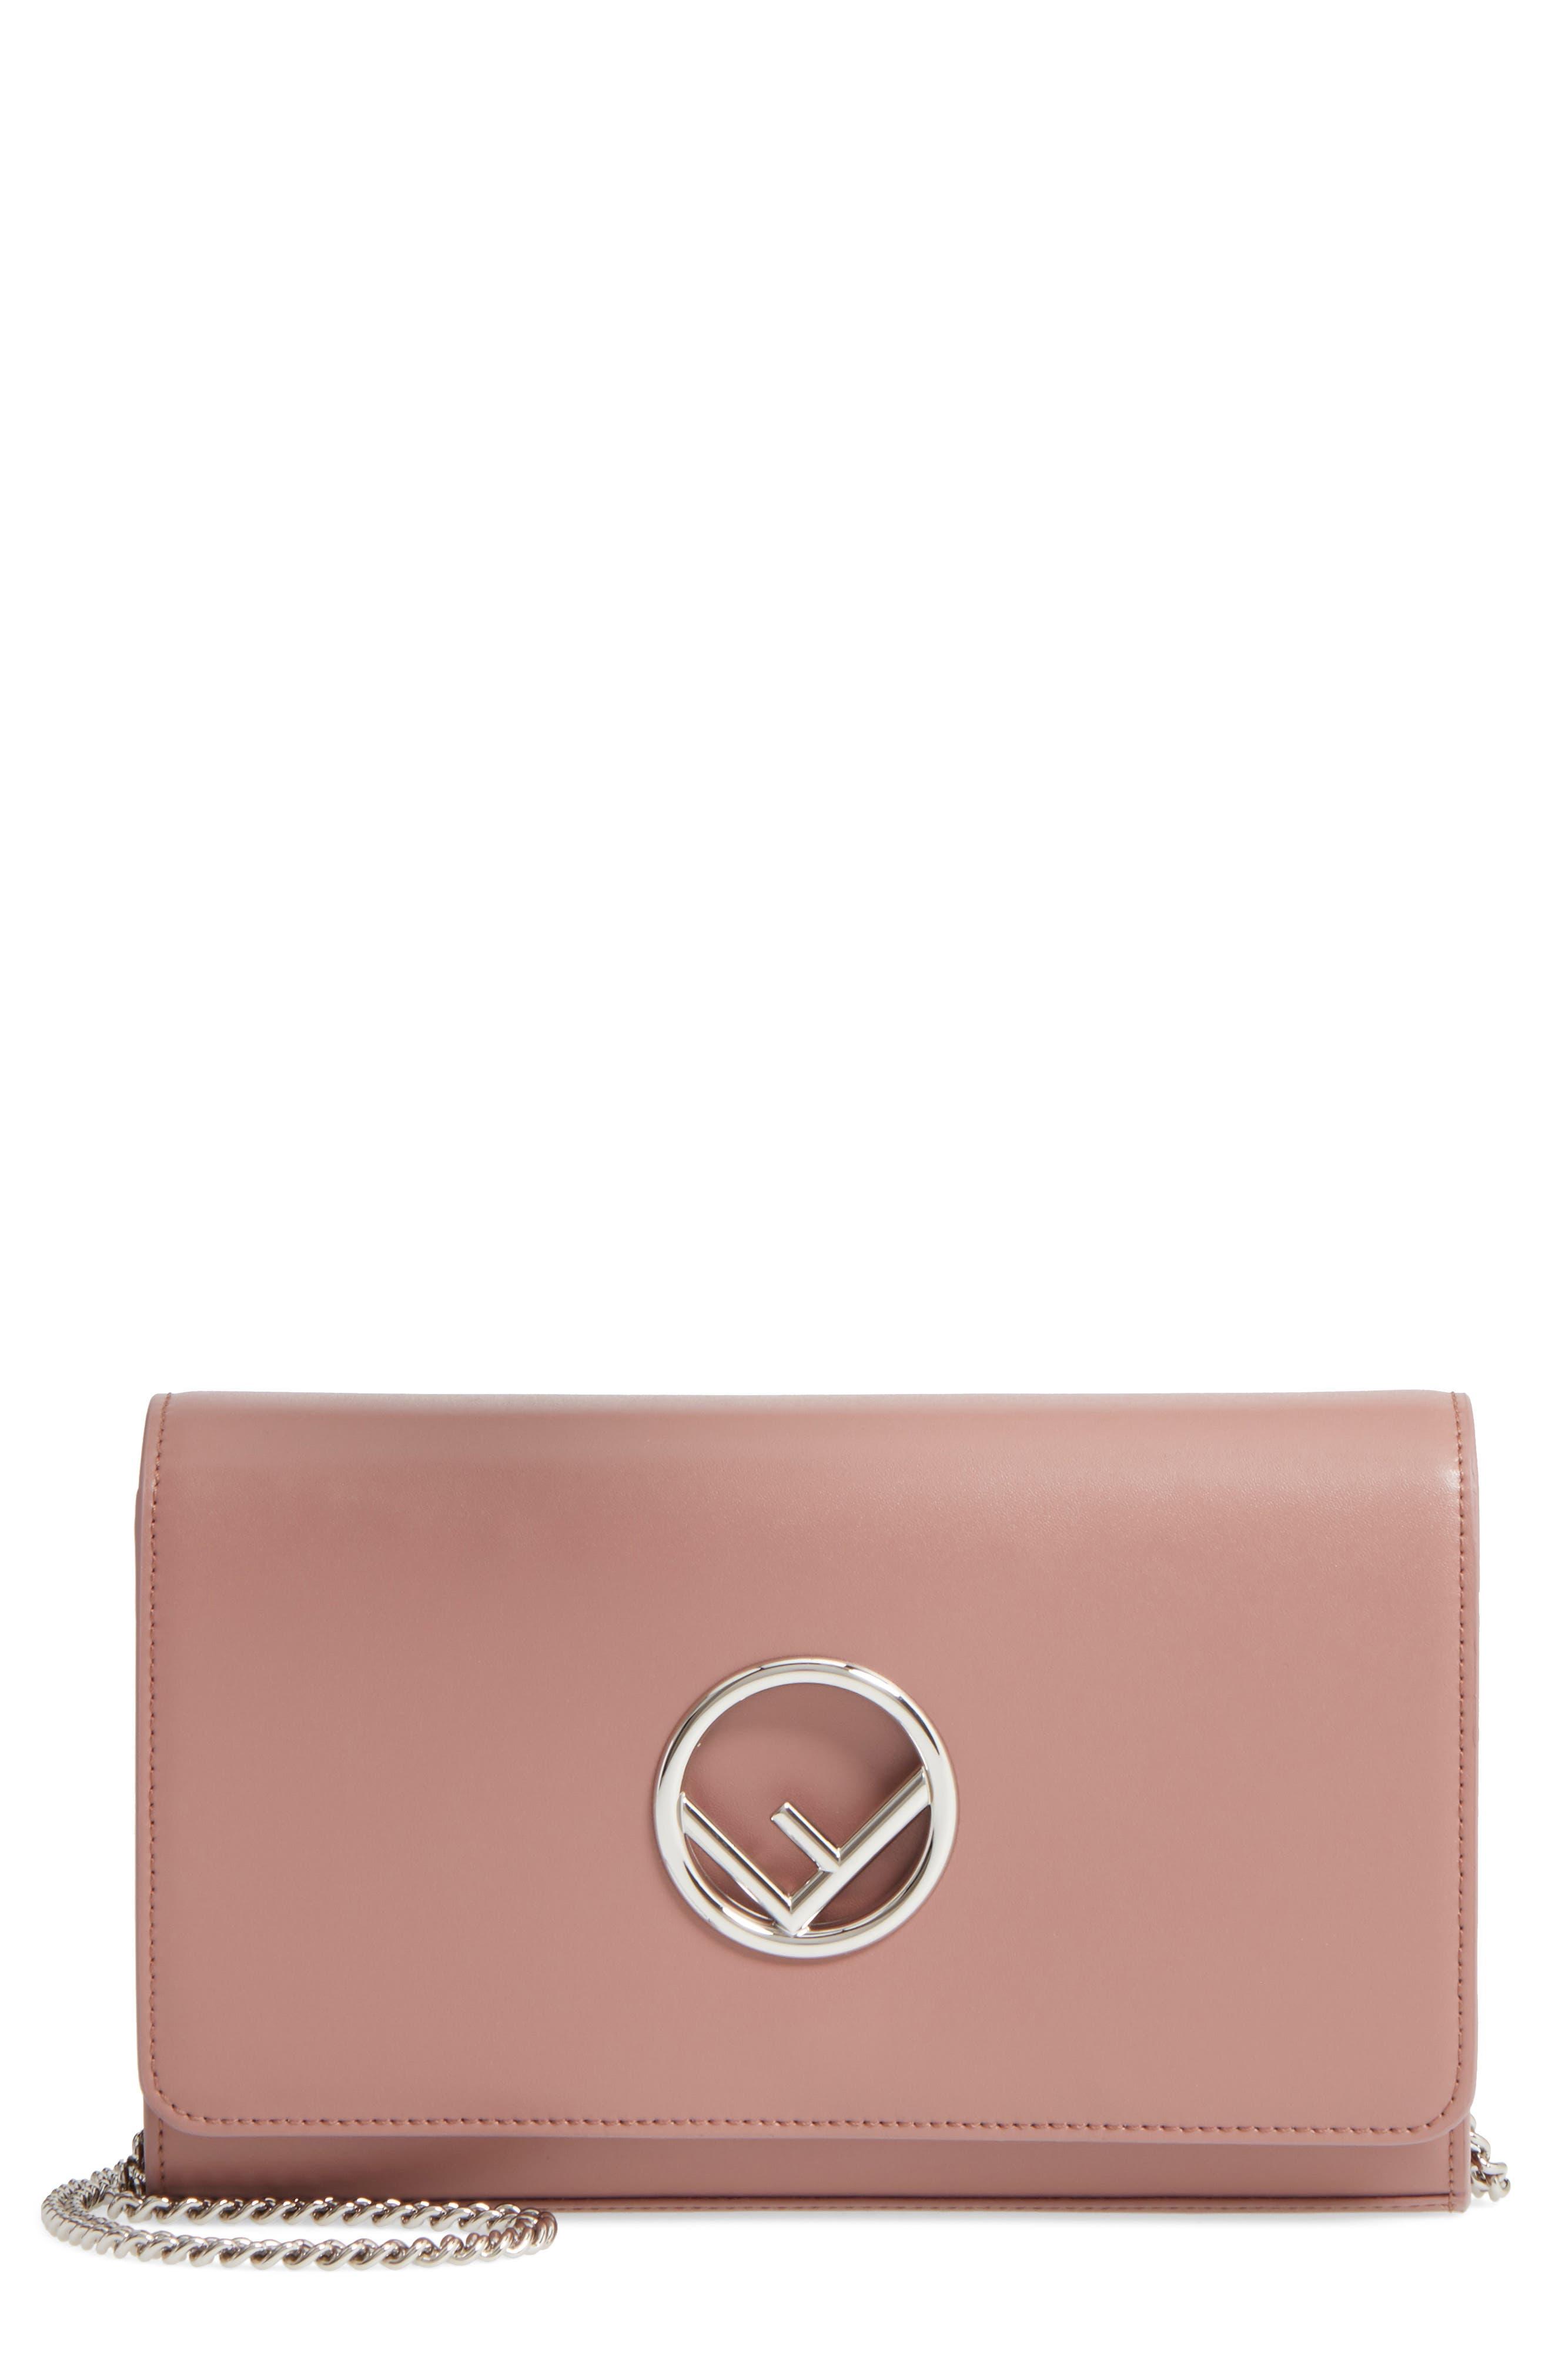 Fendi Liberty Logo Calfskin Leather Wallet on a Chain